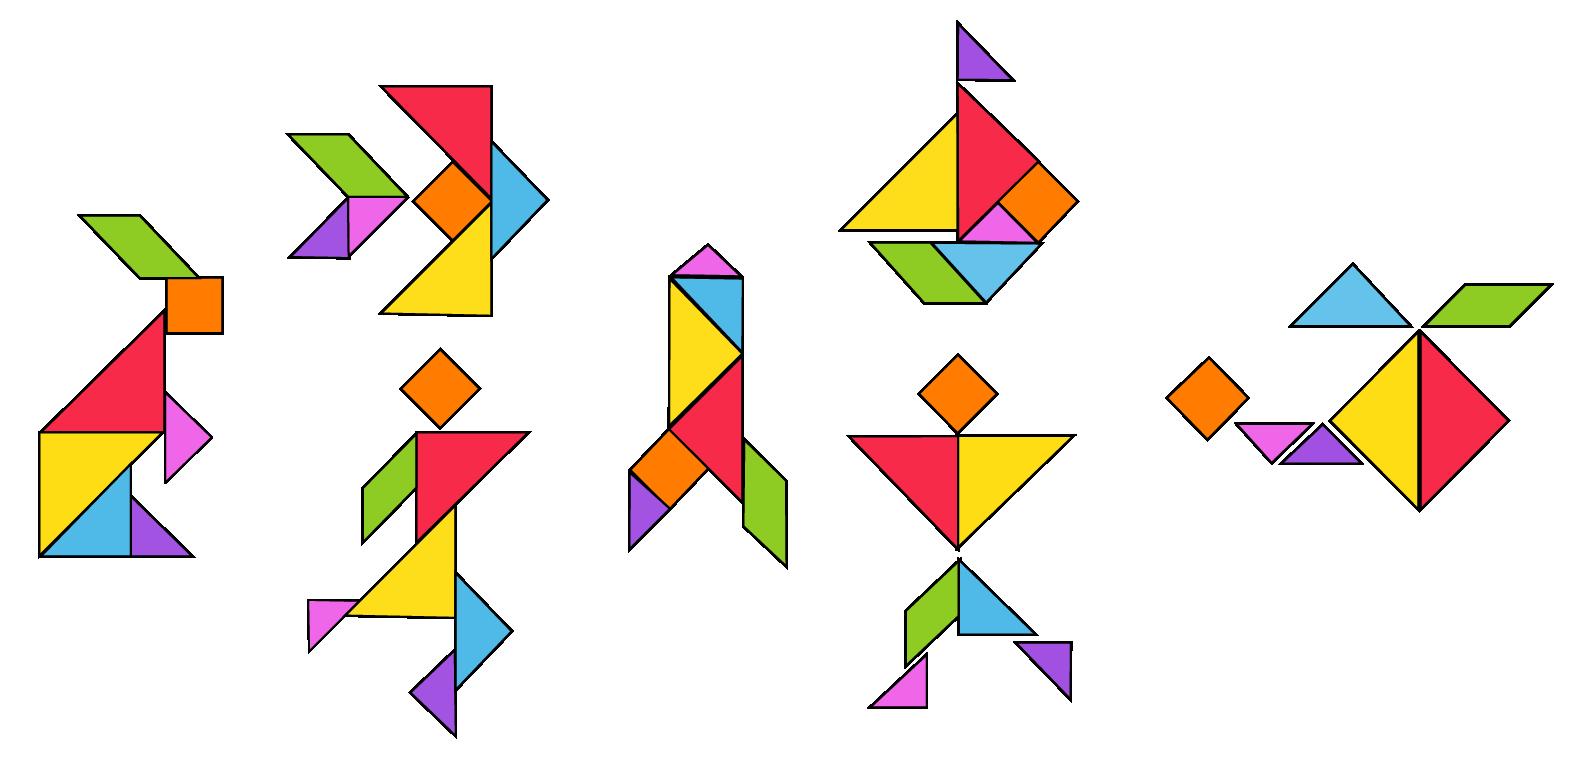 Interesting shapes of 7-piece tangram